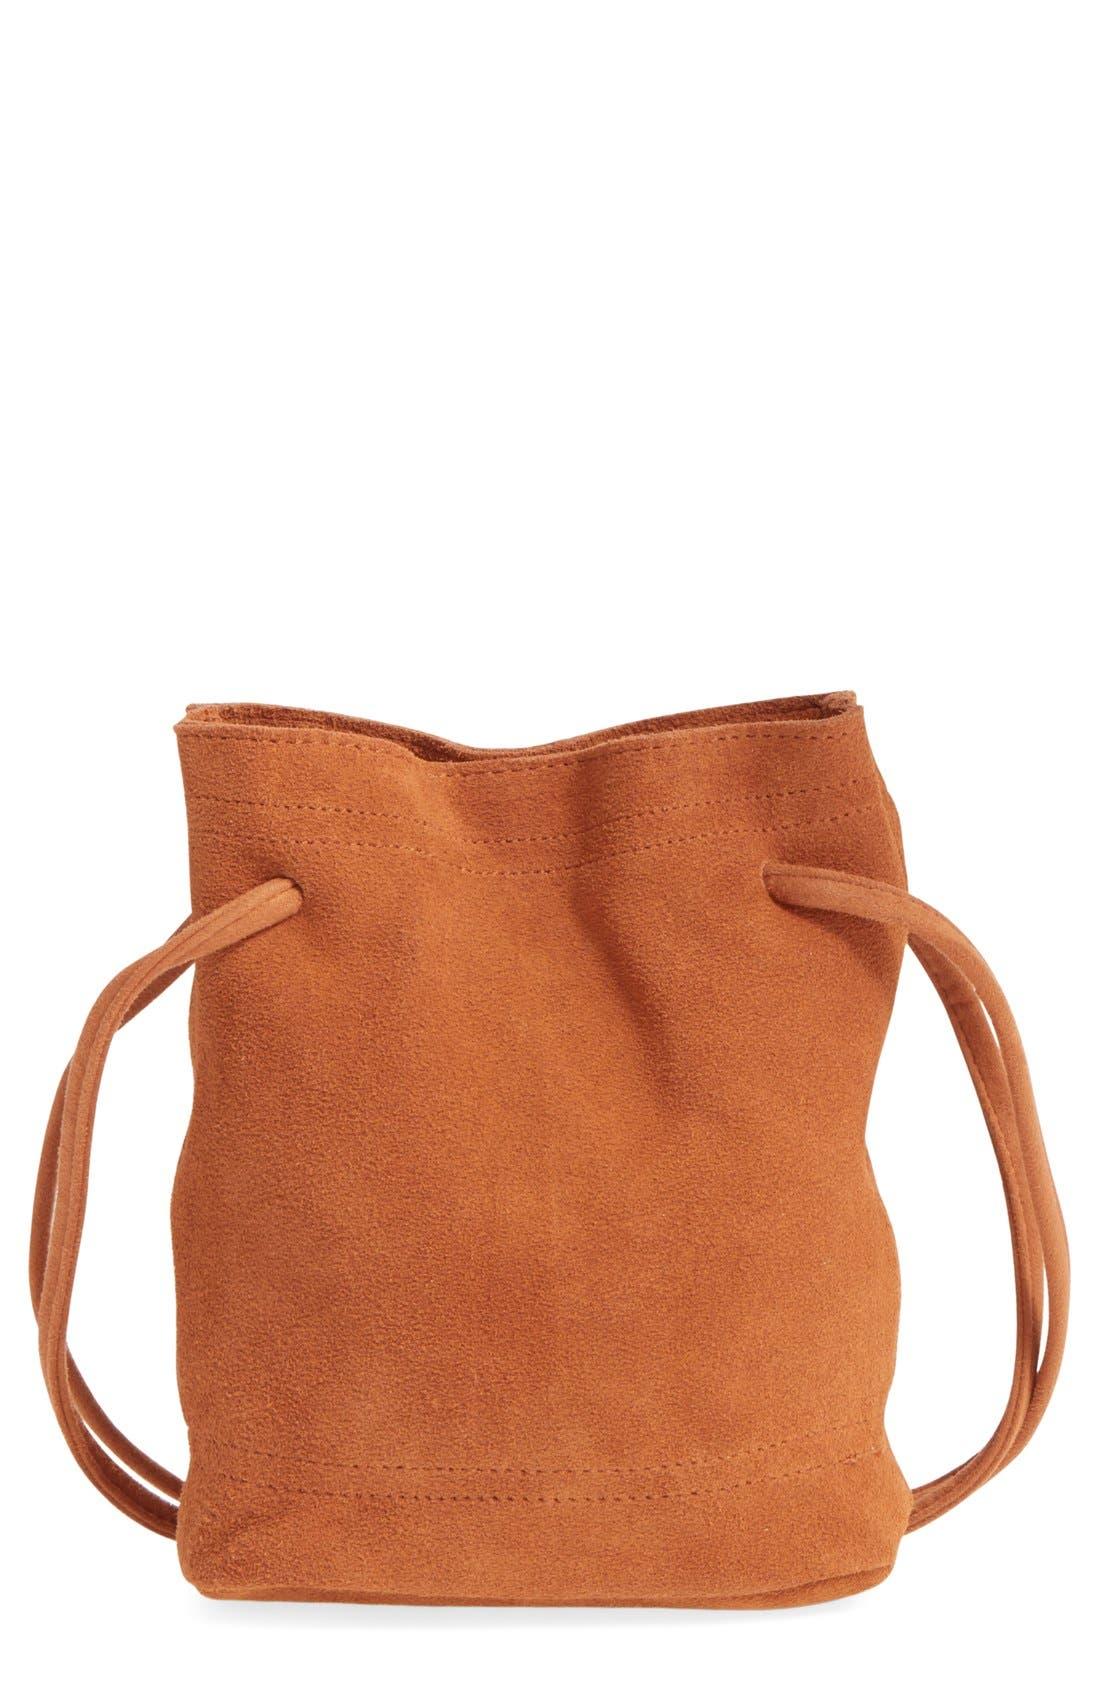 Main Image - Street Level Suede Crossbody Bag